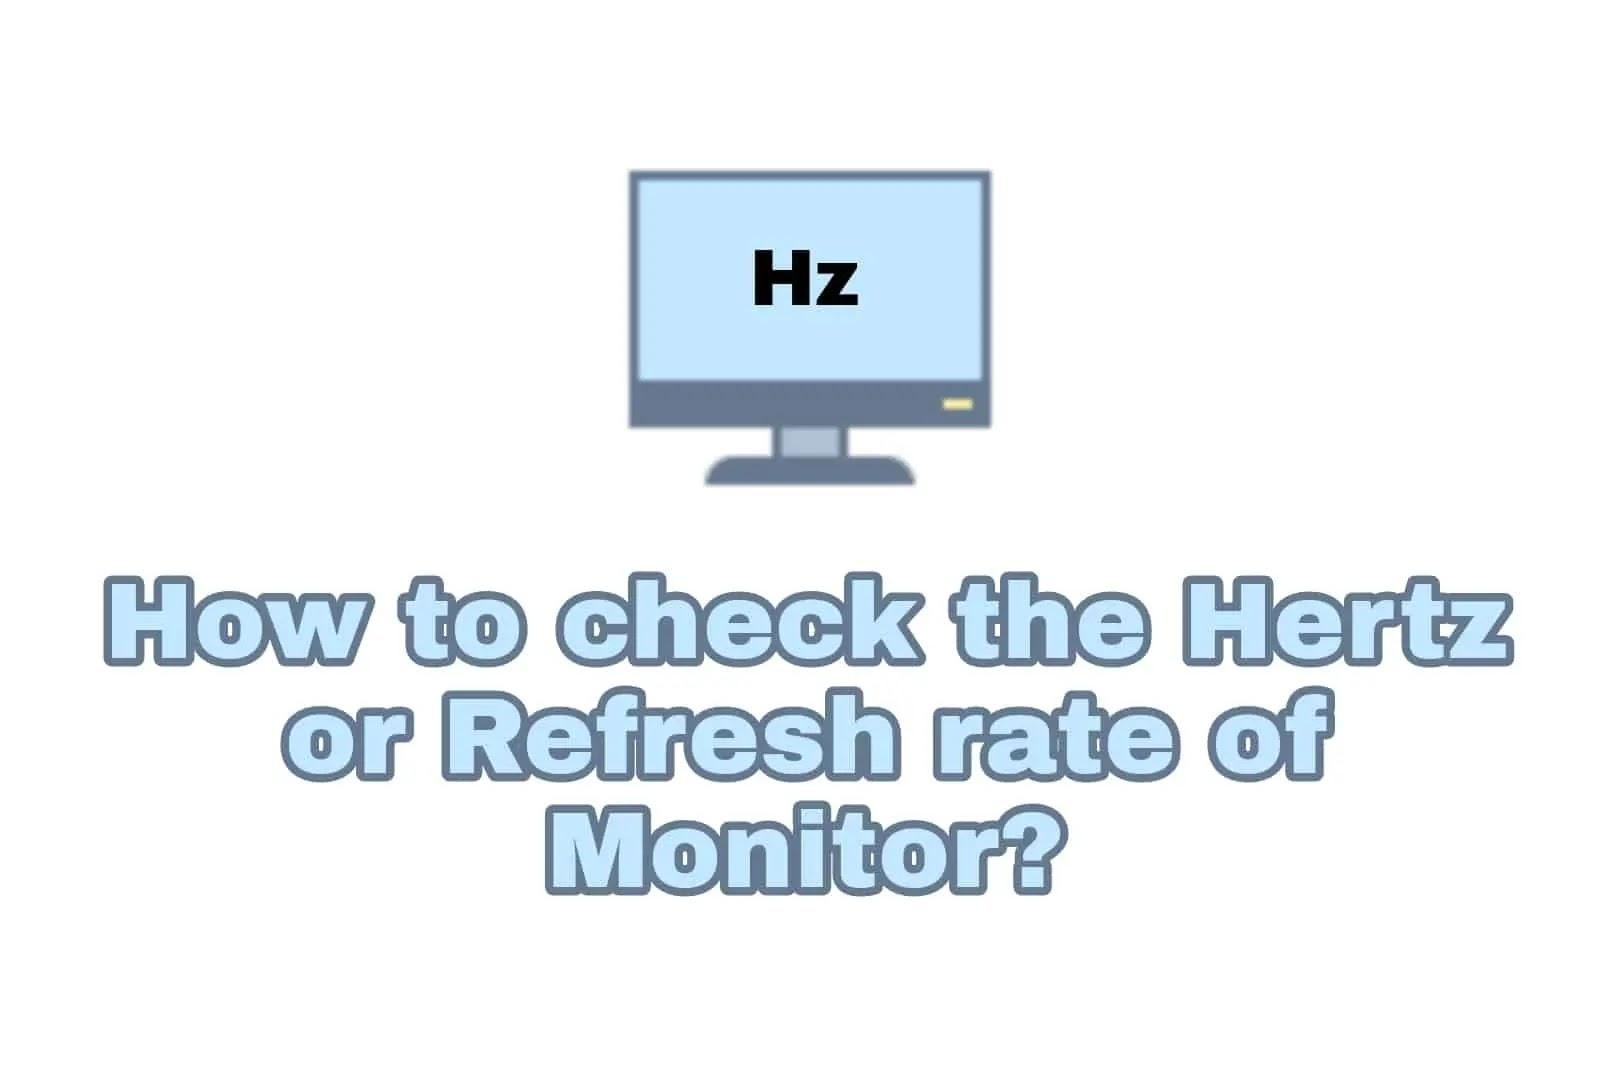 how many hertz is my monitor